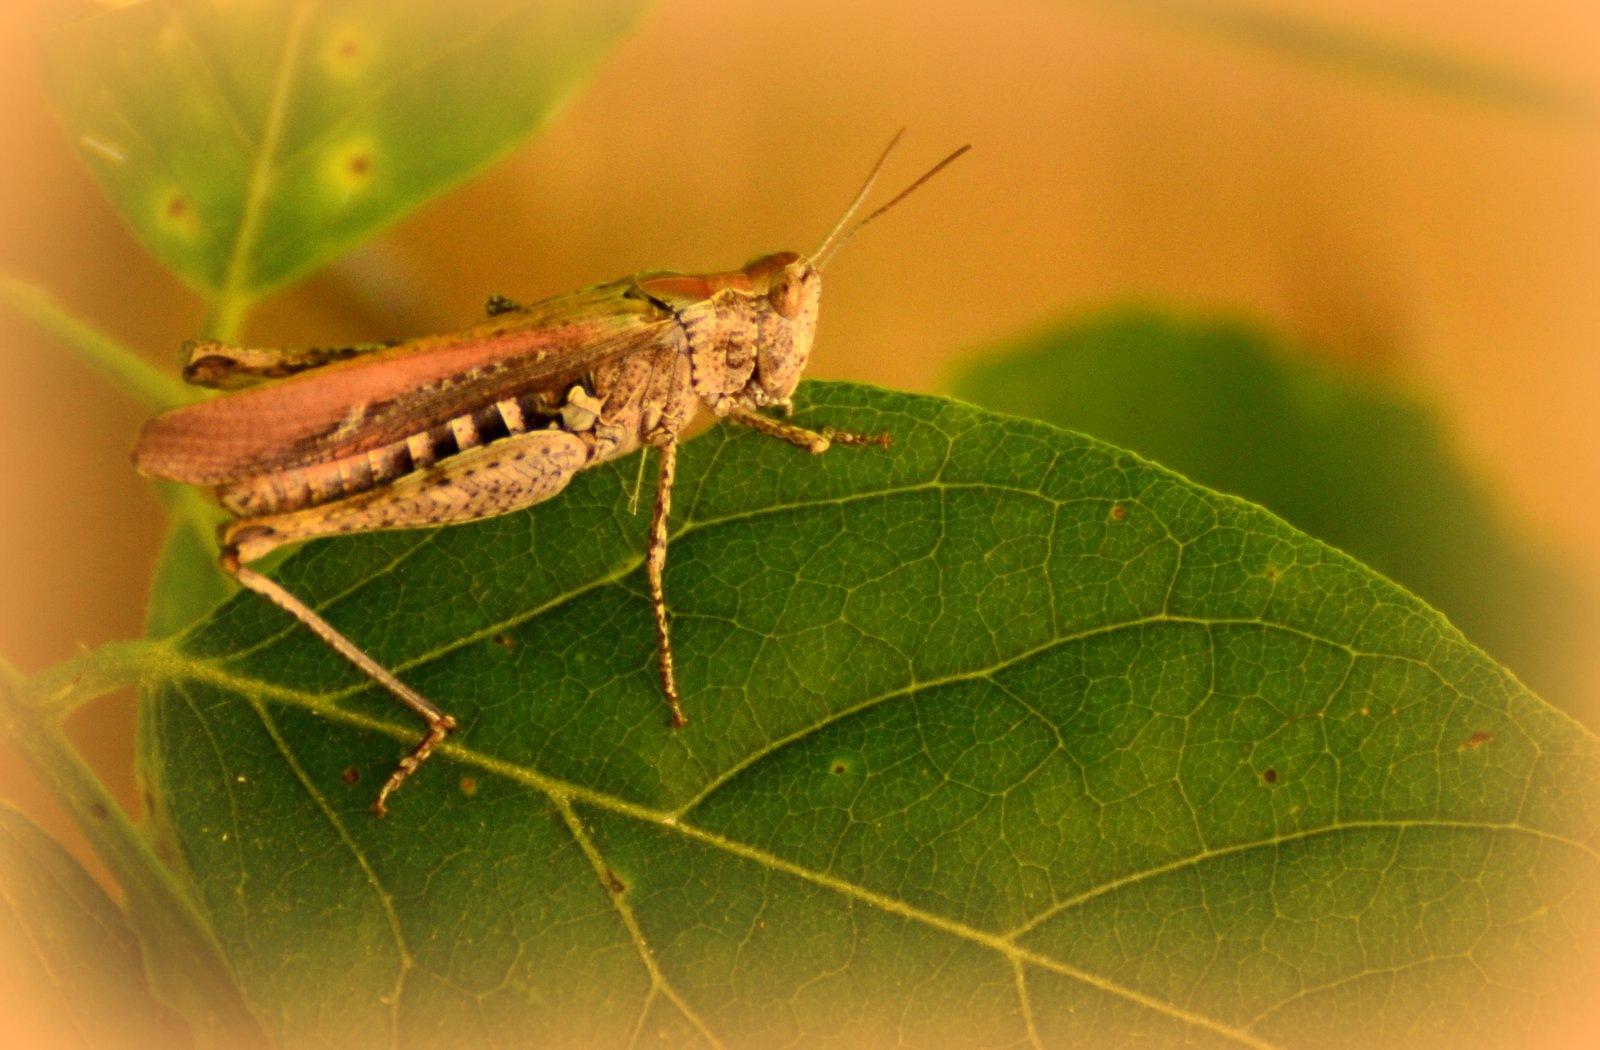 Grasshopper by jeffdixon